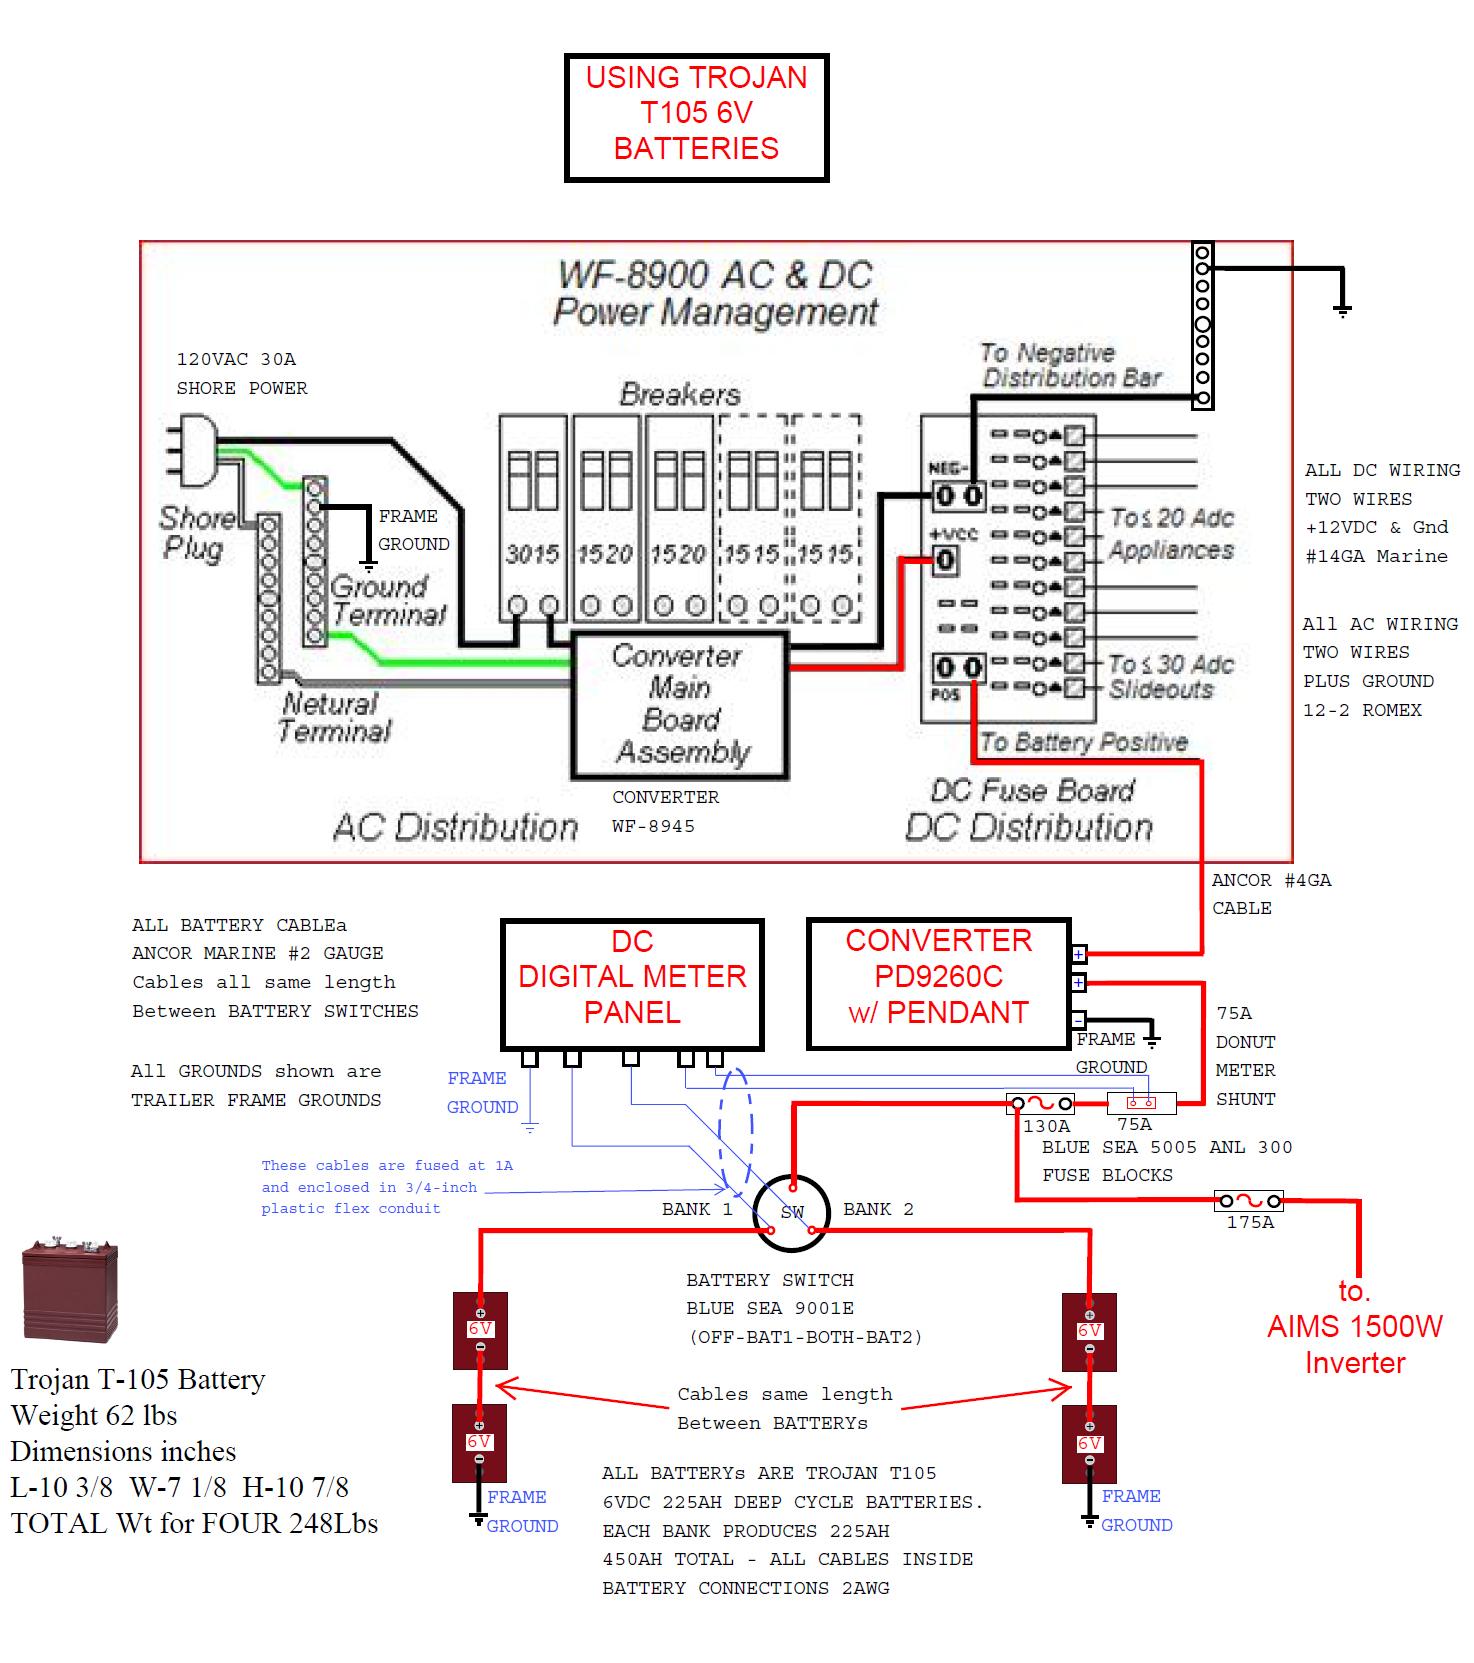 Aac Disconnect Wiring | Wiring Diagram - Rv Inverter Wiring Diagram